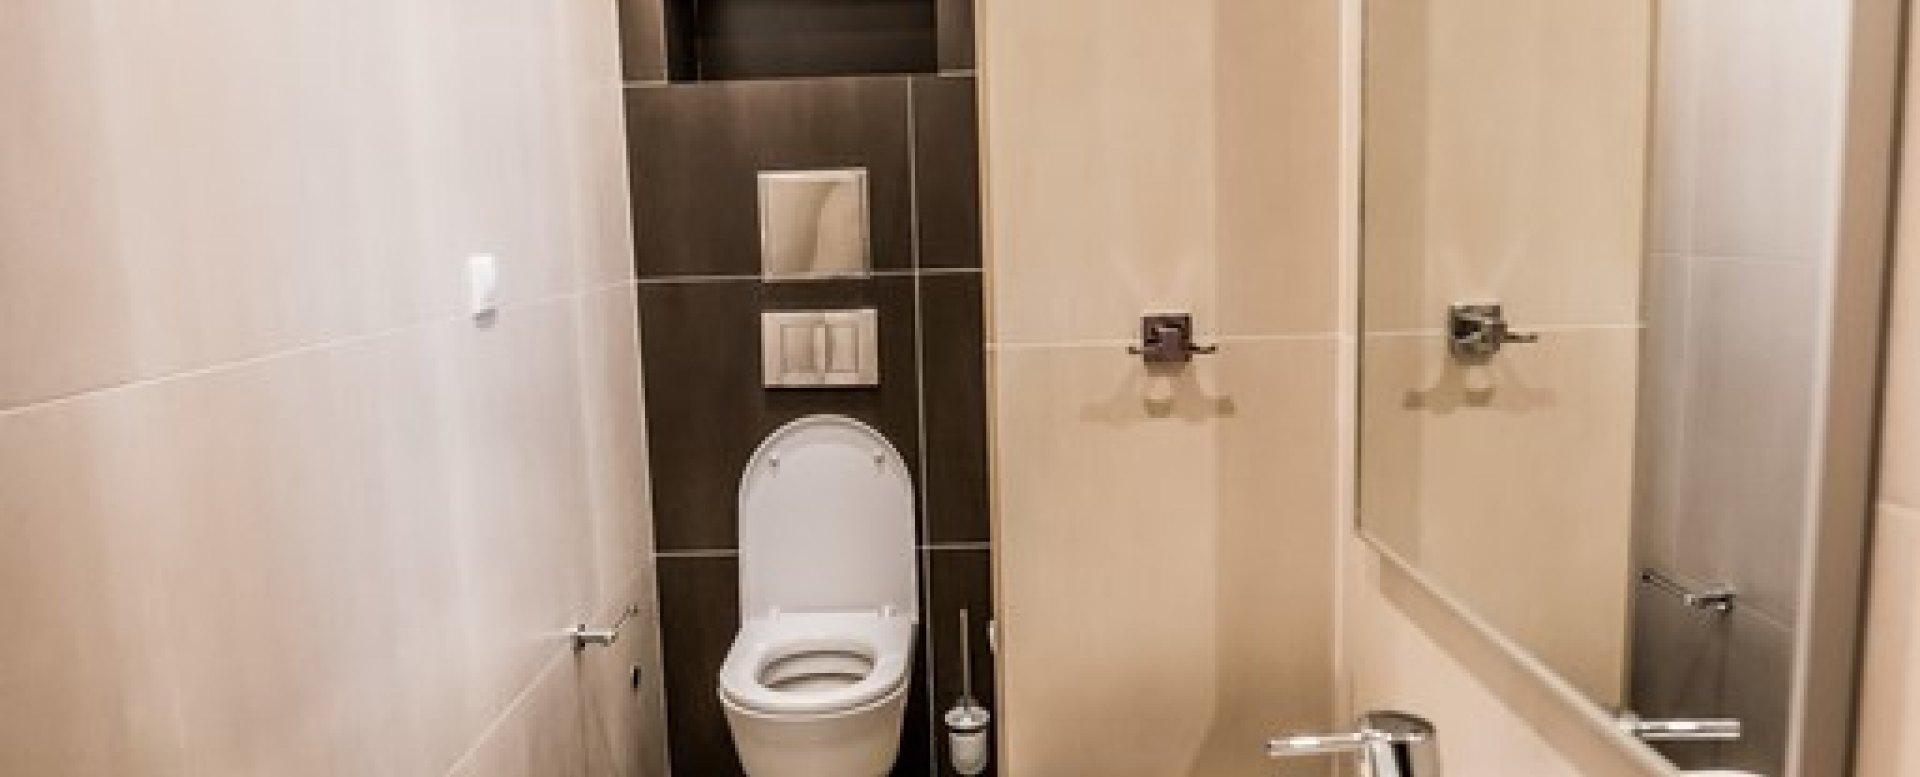 Toaleta (WC) v 3-izbovom byte na Botovej v Žiline